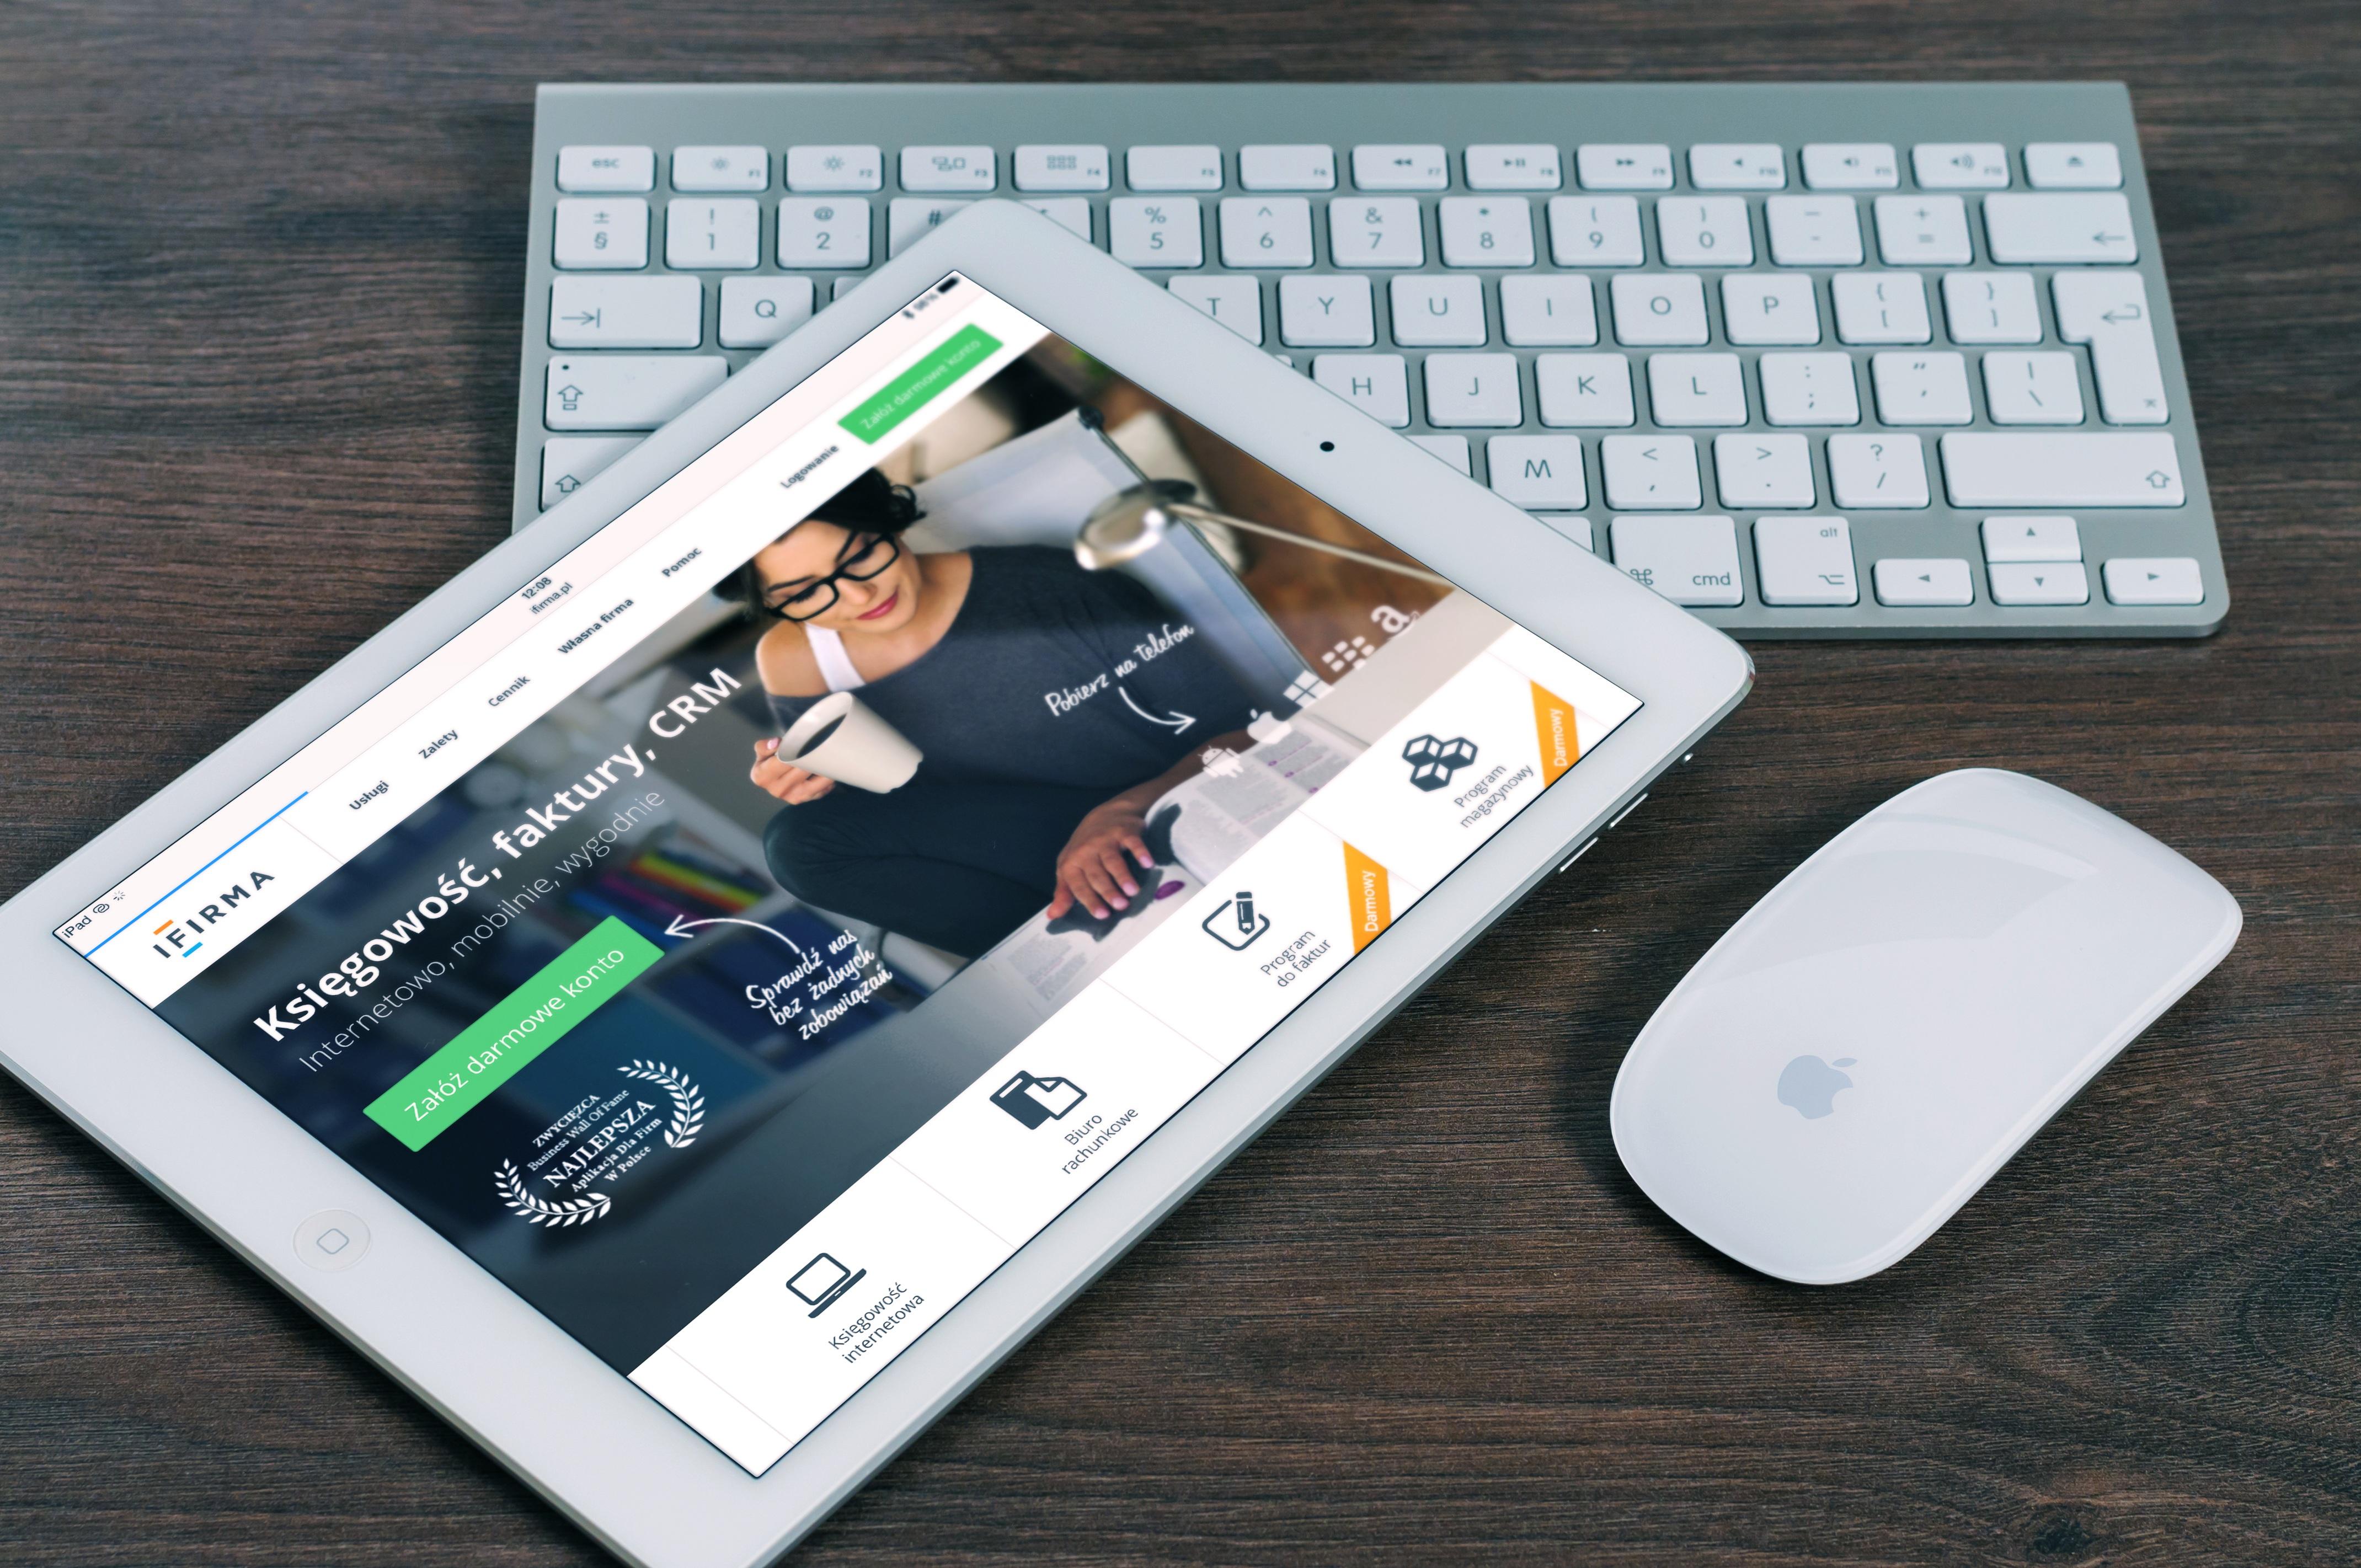 apple and lenovos technology stratagy